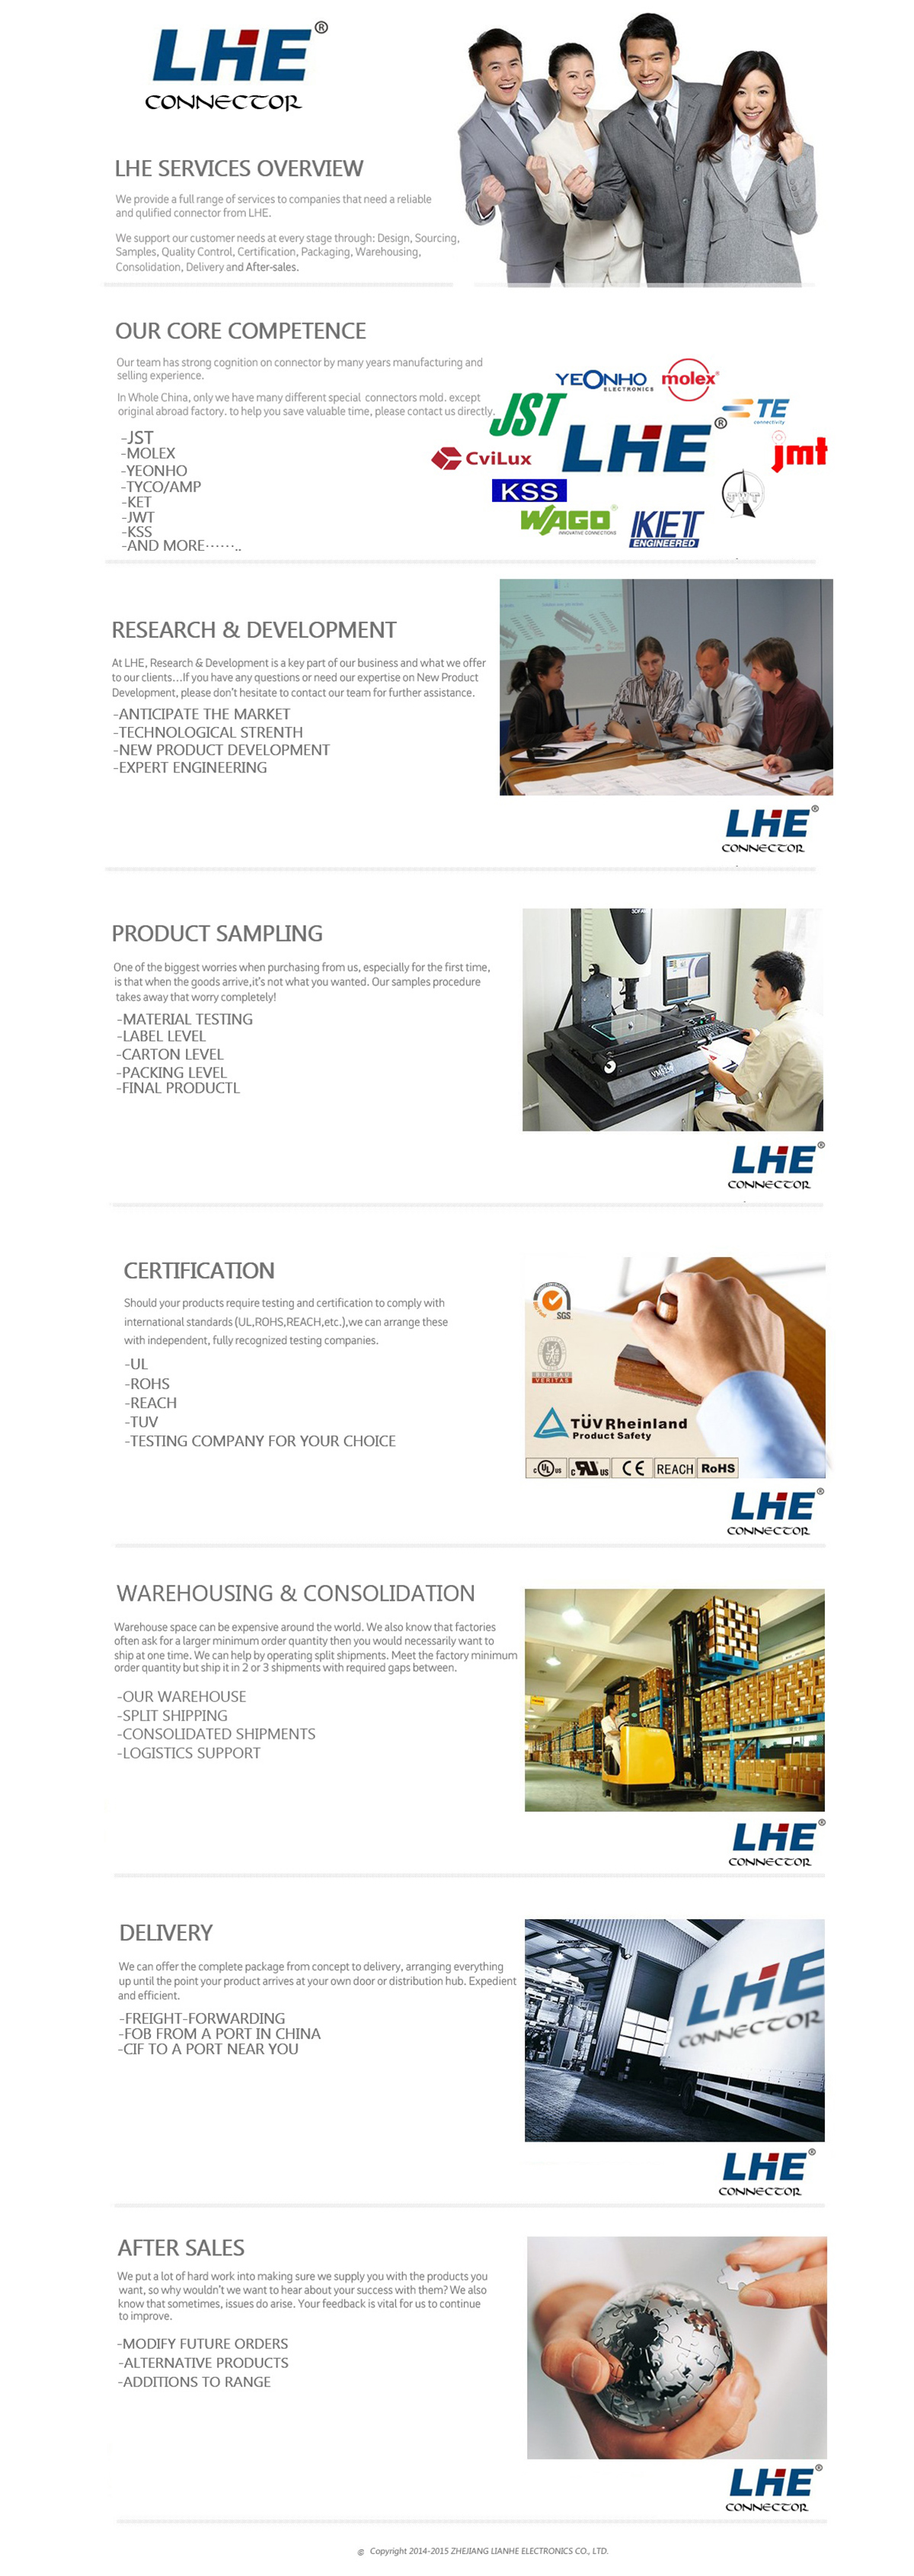 LHE Service